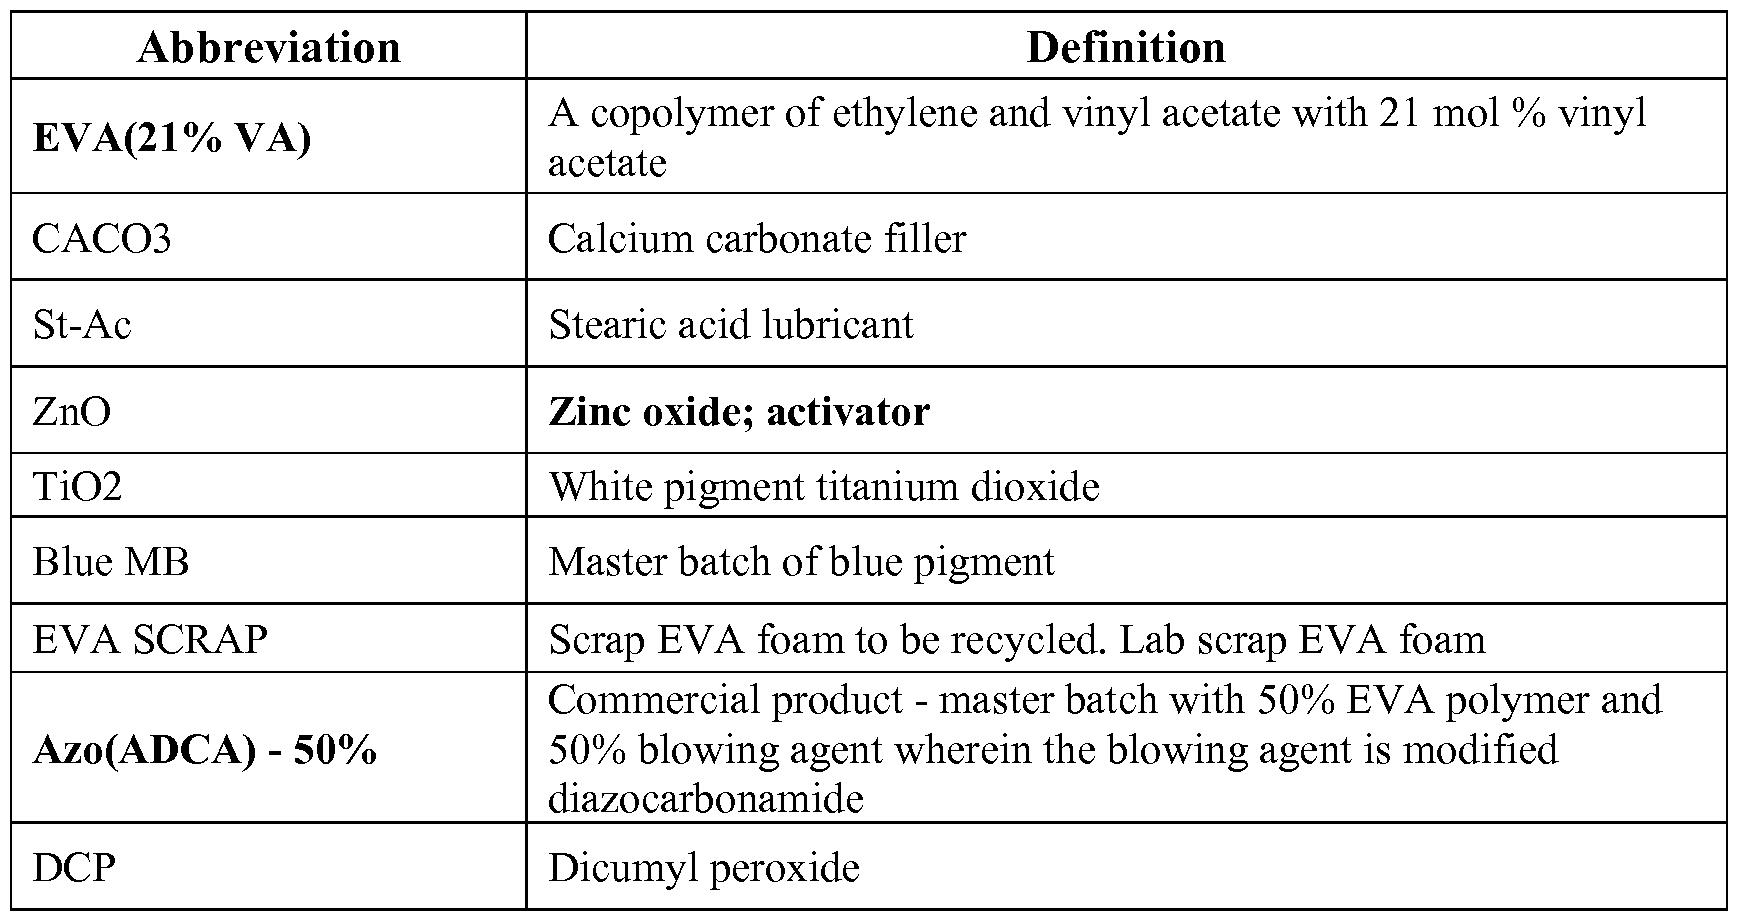 WO2014039218A1 - Eva recycling method - Google Patents